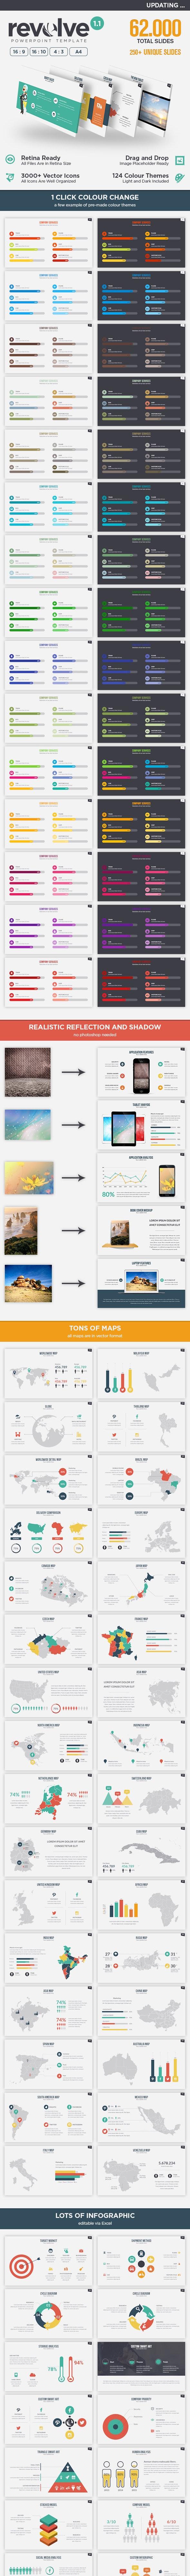 Revolve - Multipurpose Powerpoint Template - Business PowerPoint Templates